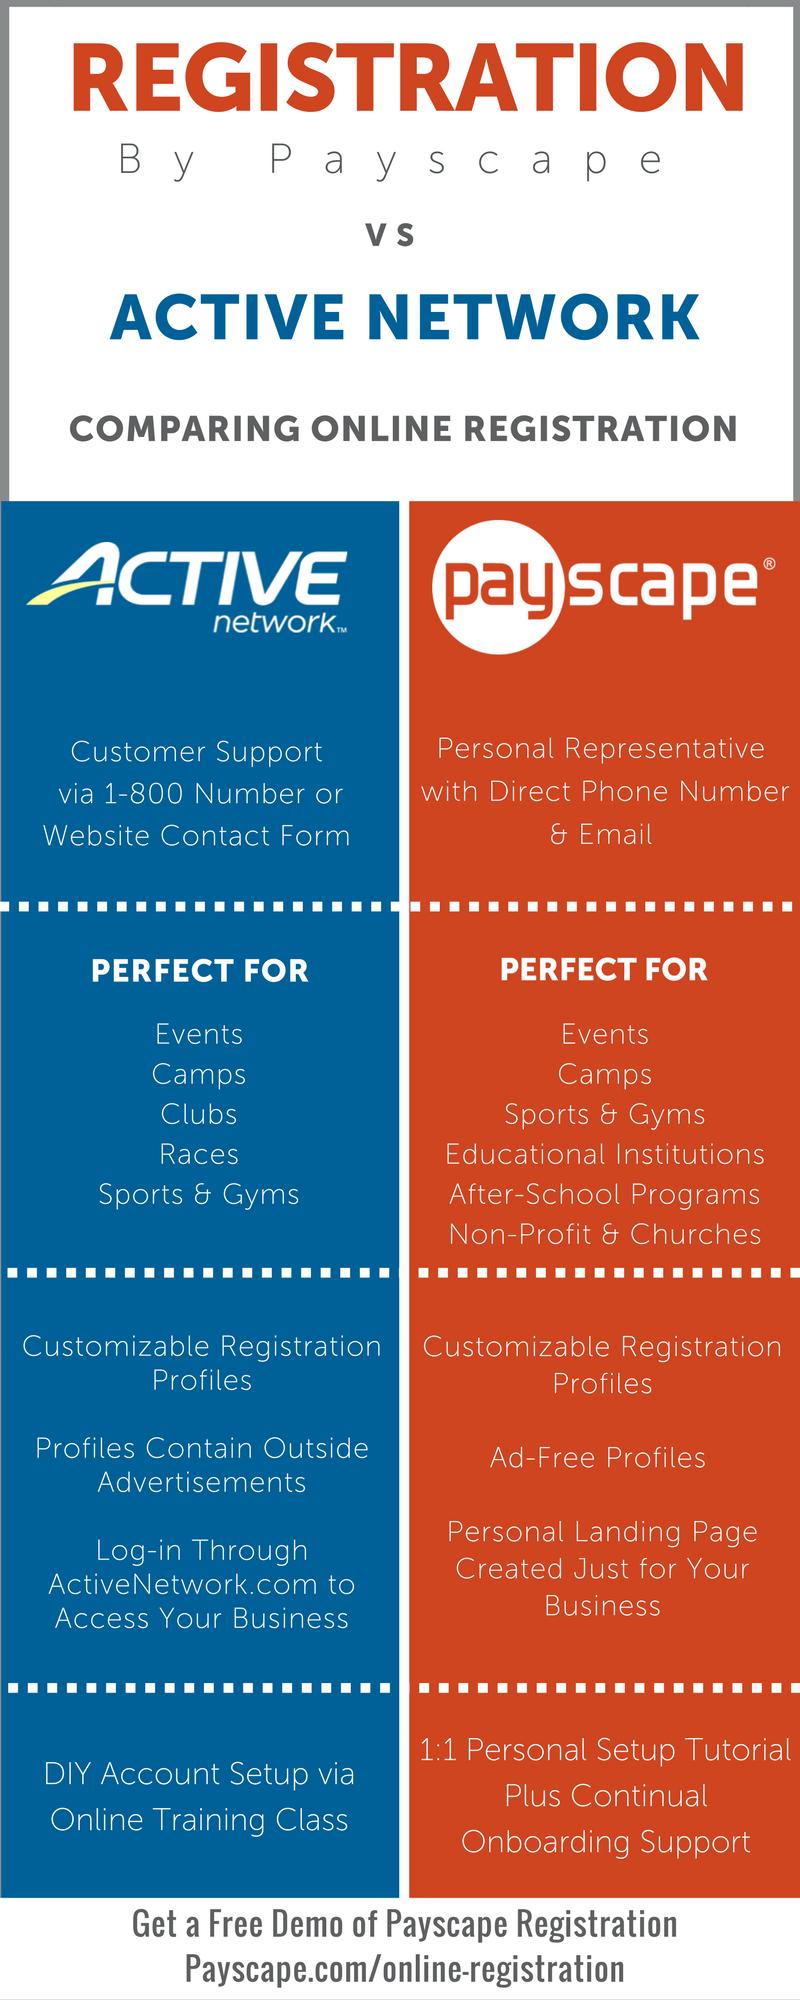 Payscape_Registration-_comparing_Online_Registration_Online_Event_Planning_-_Infographic_FINAL.png